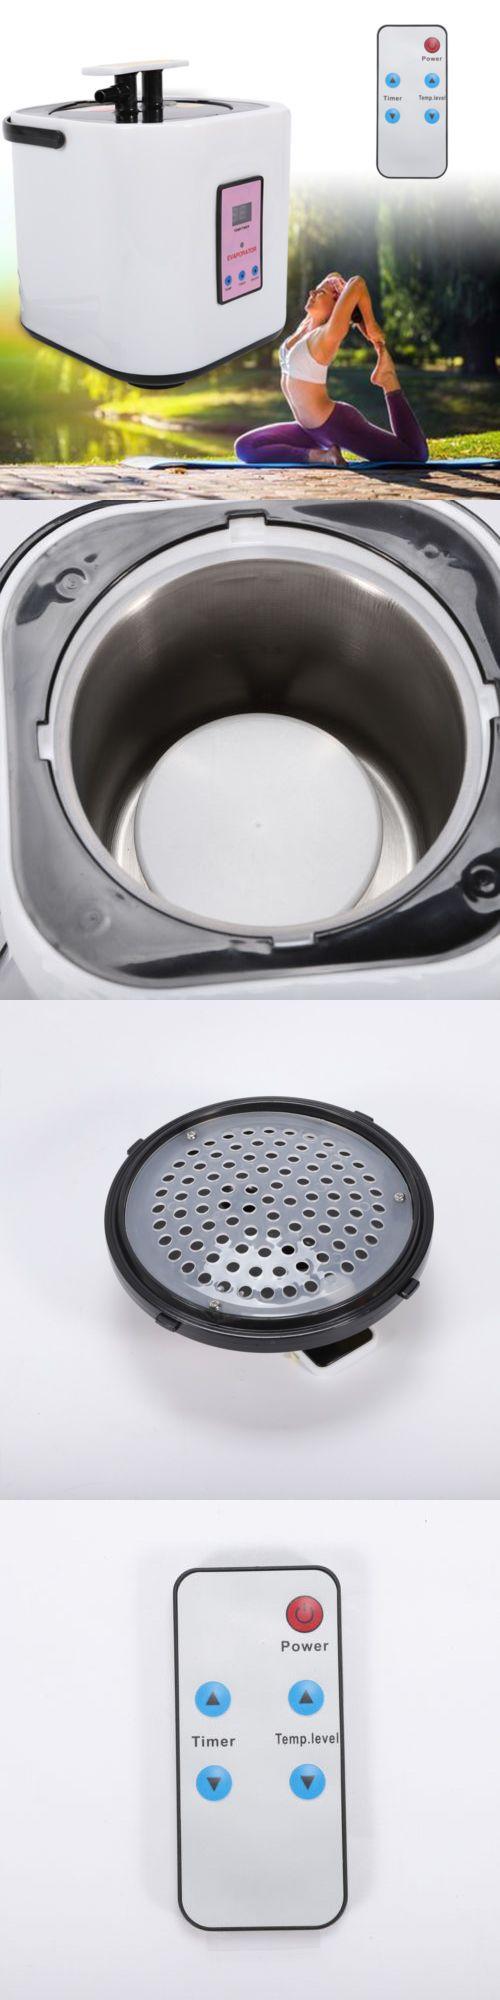 Details About 2l Portable Sauna Steamer Pot Machine Home Spa Steam